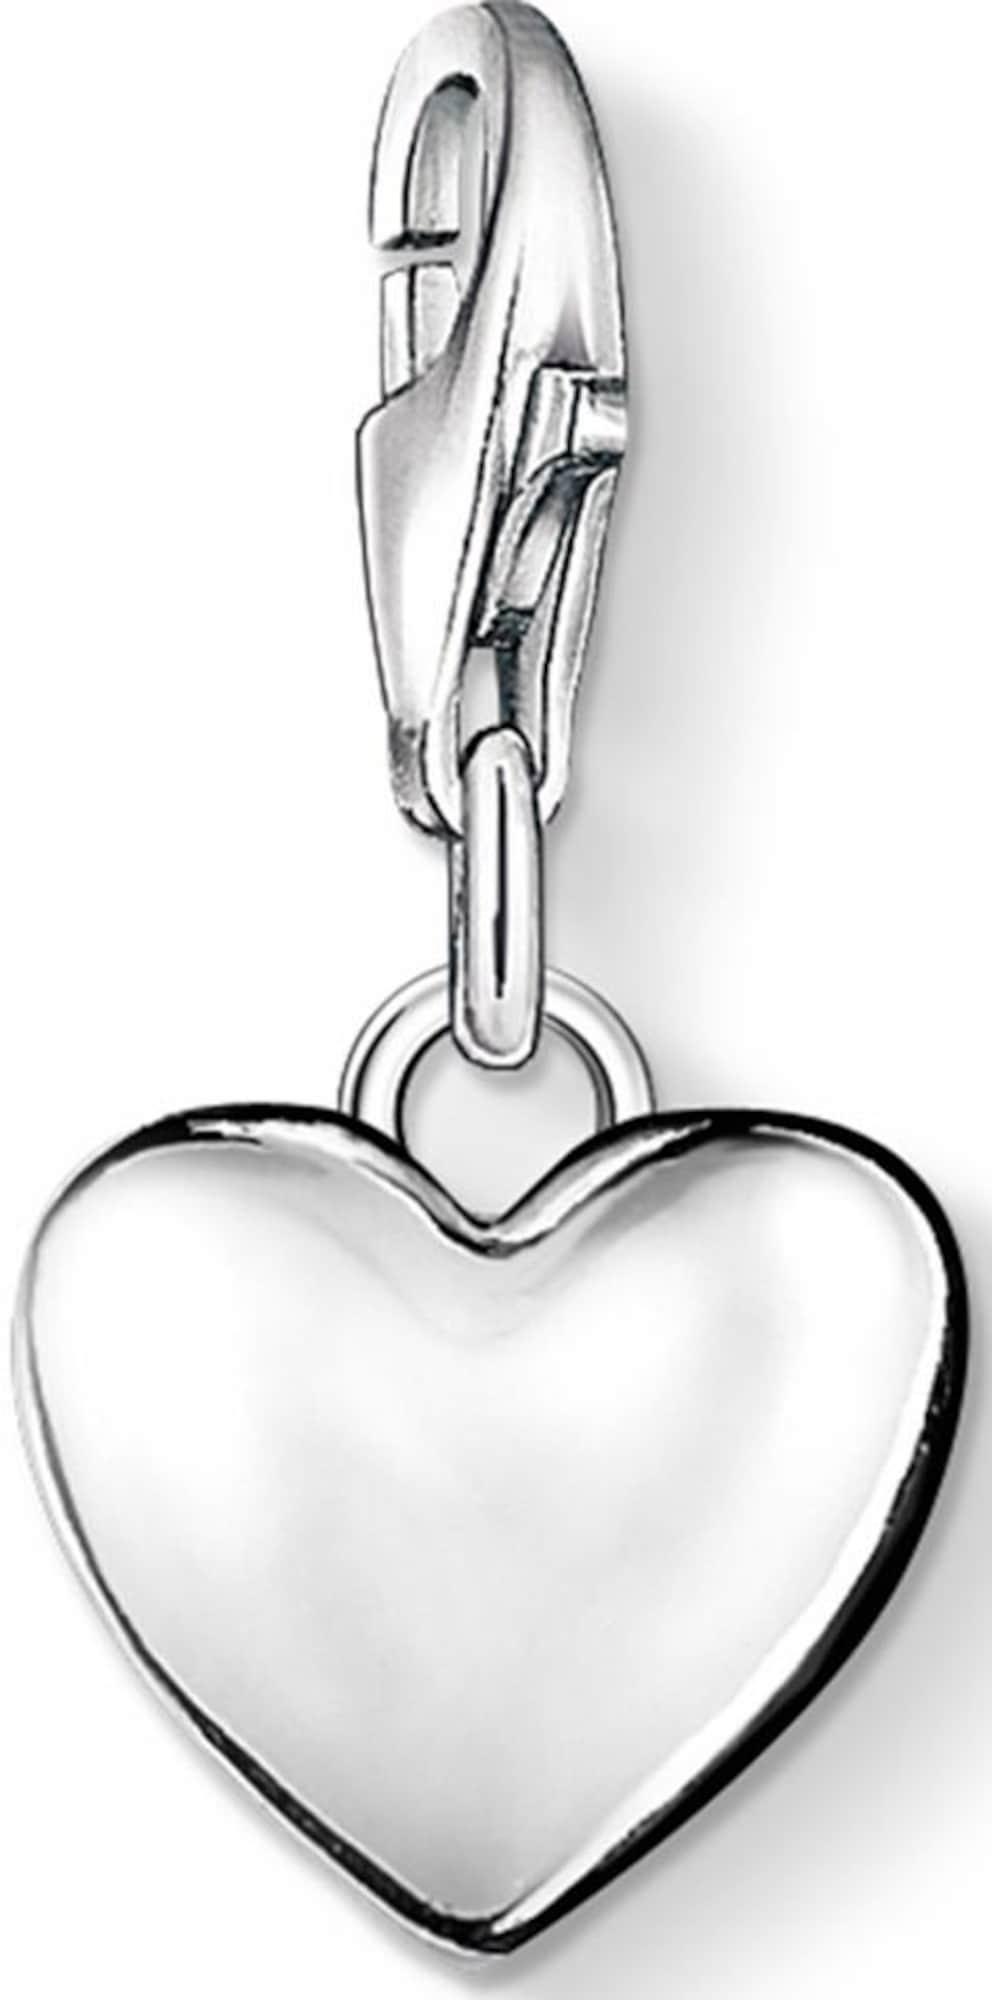 Charm-Einhänger 'Herz, 0913-001-12' | Schmuck > Charms > Charms Anhänger | Silber | Thomas Sabo